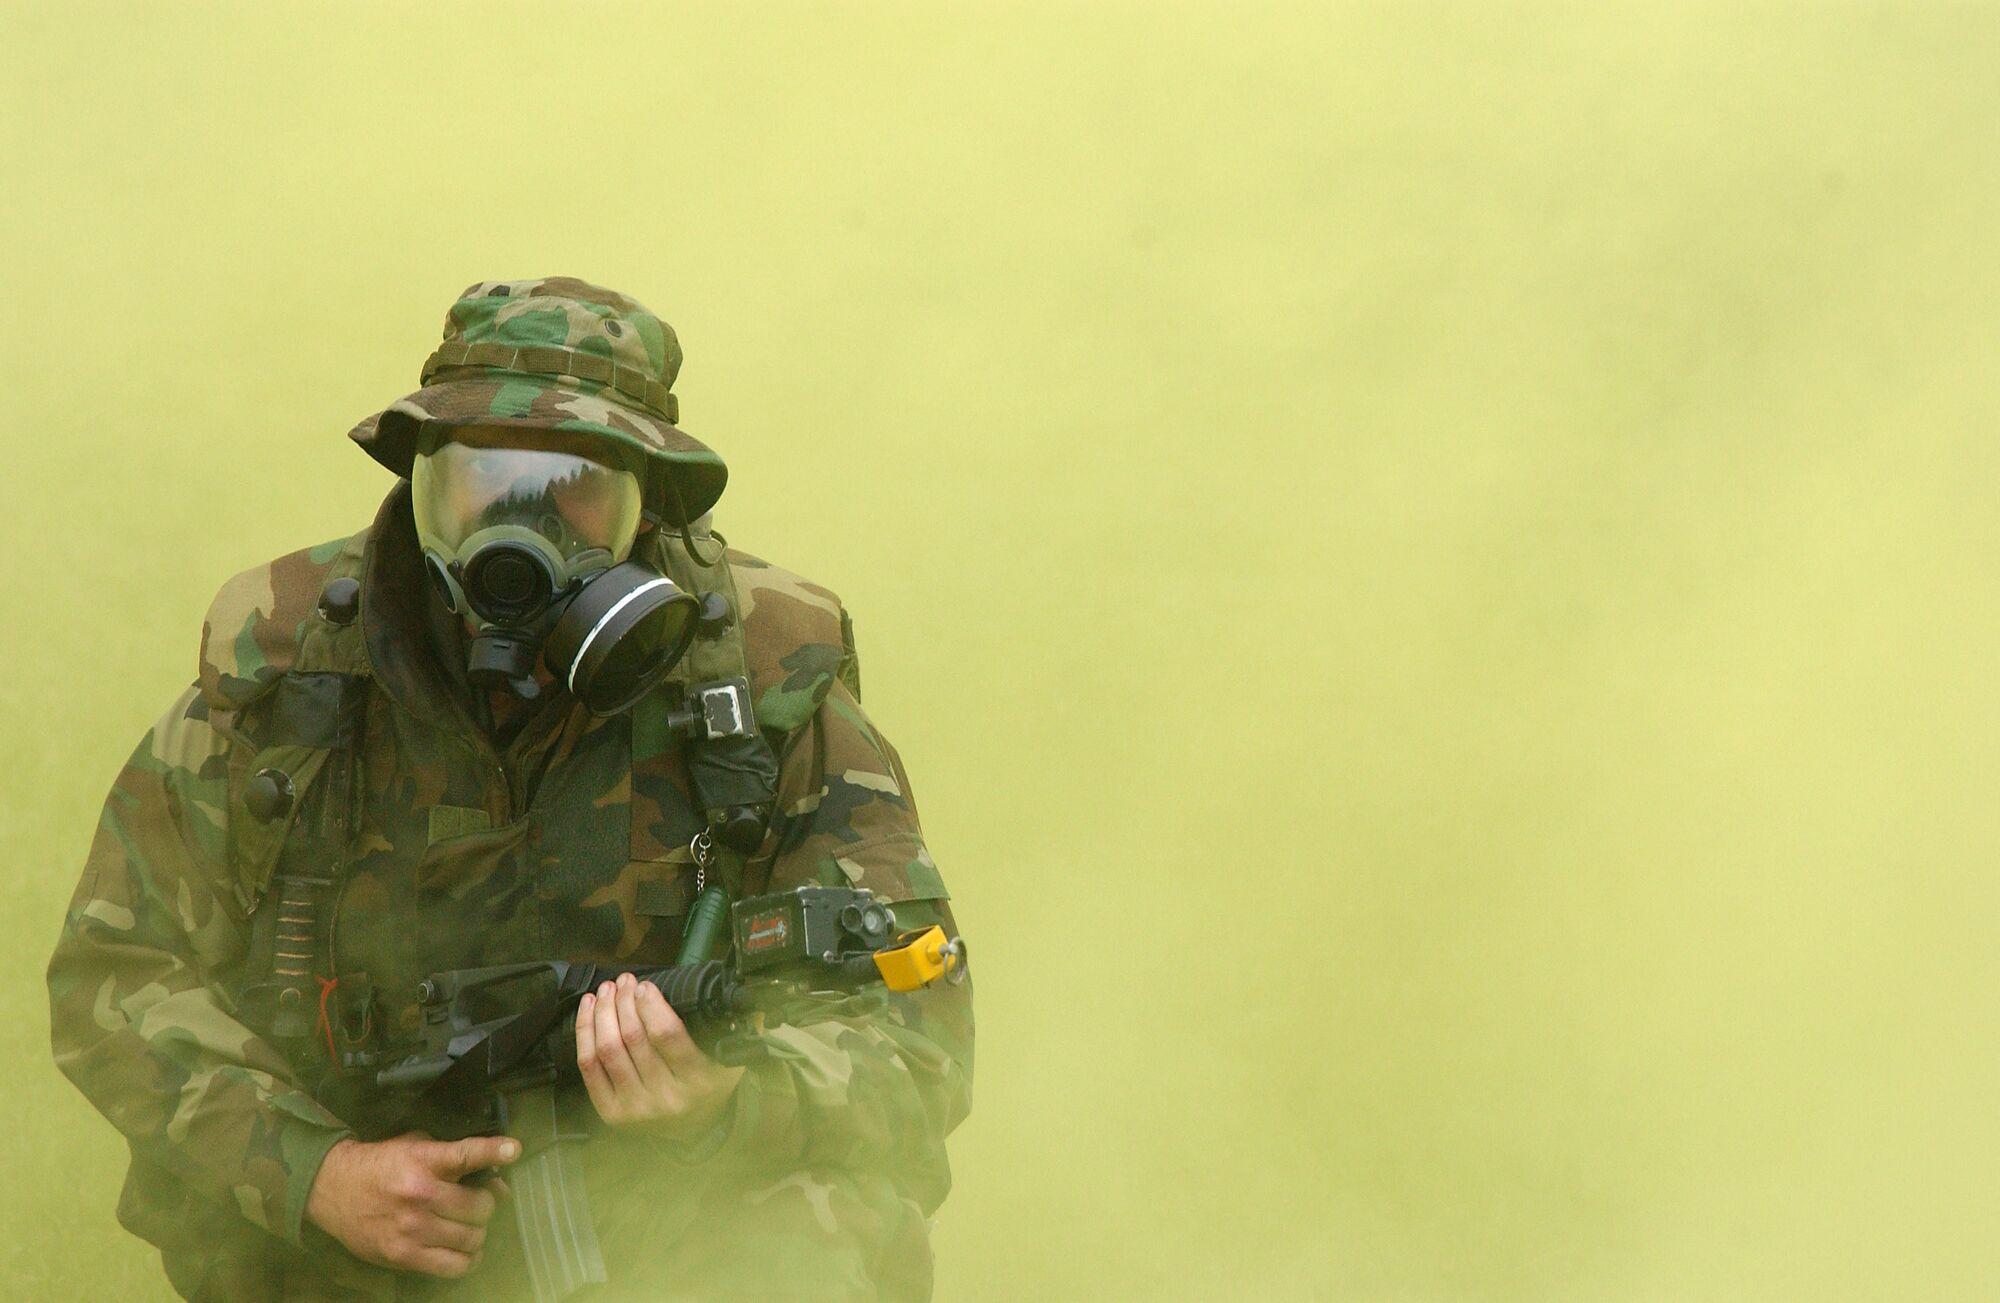 Gas Mask | Battlefield Wiki | FANDOM powered by Wikia